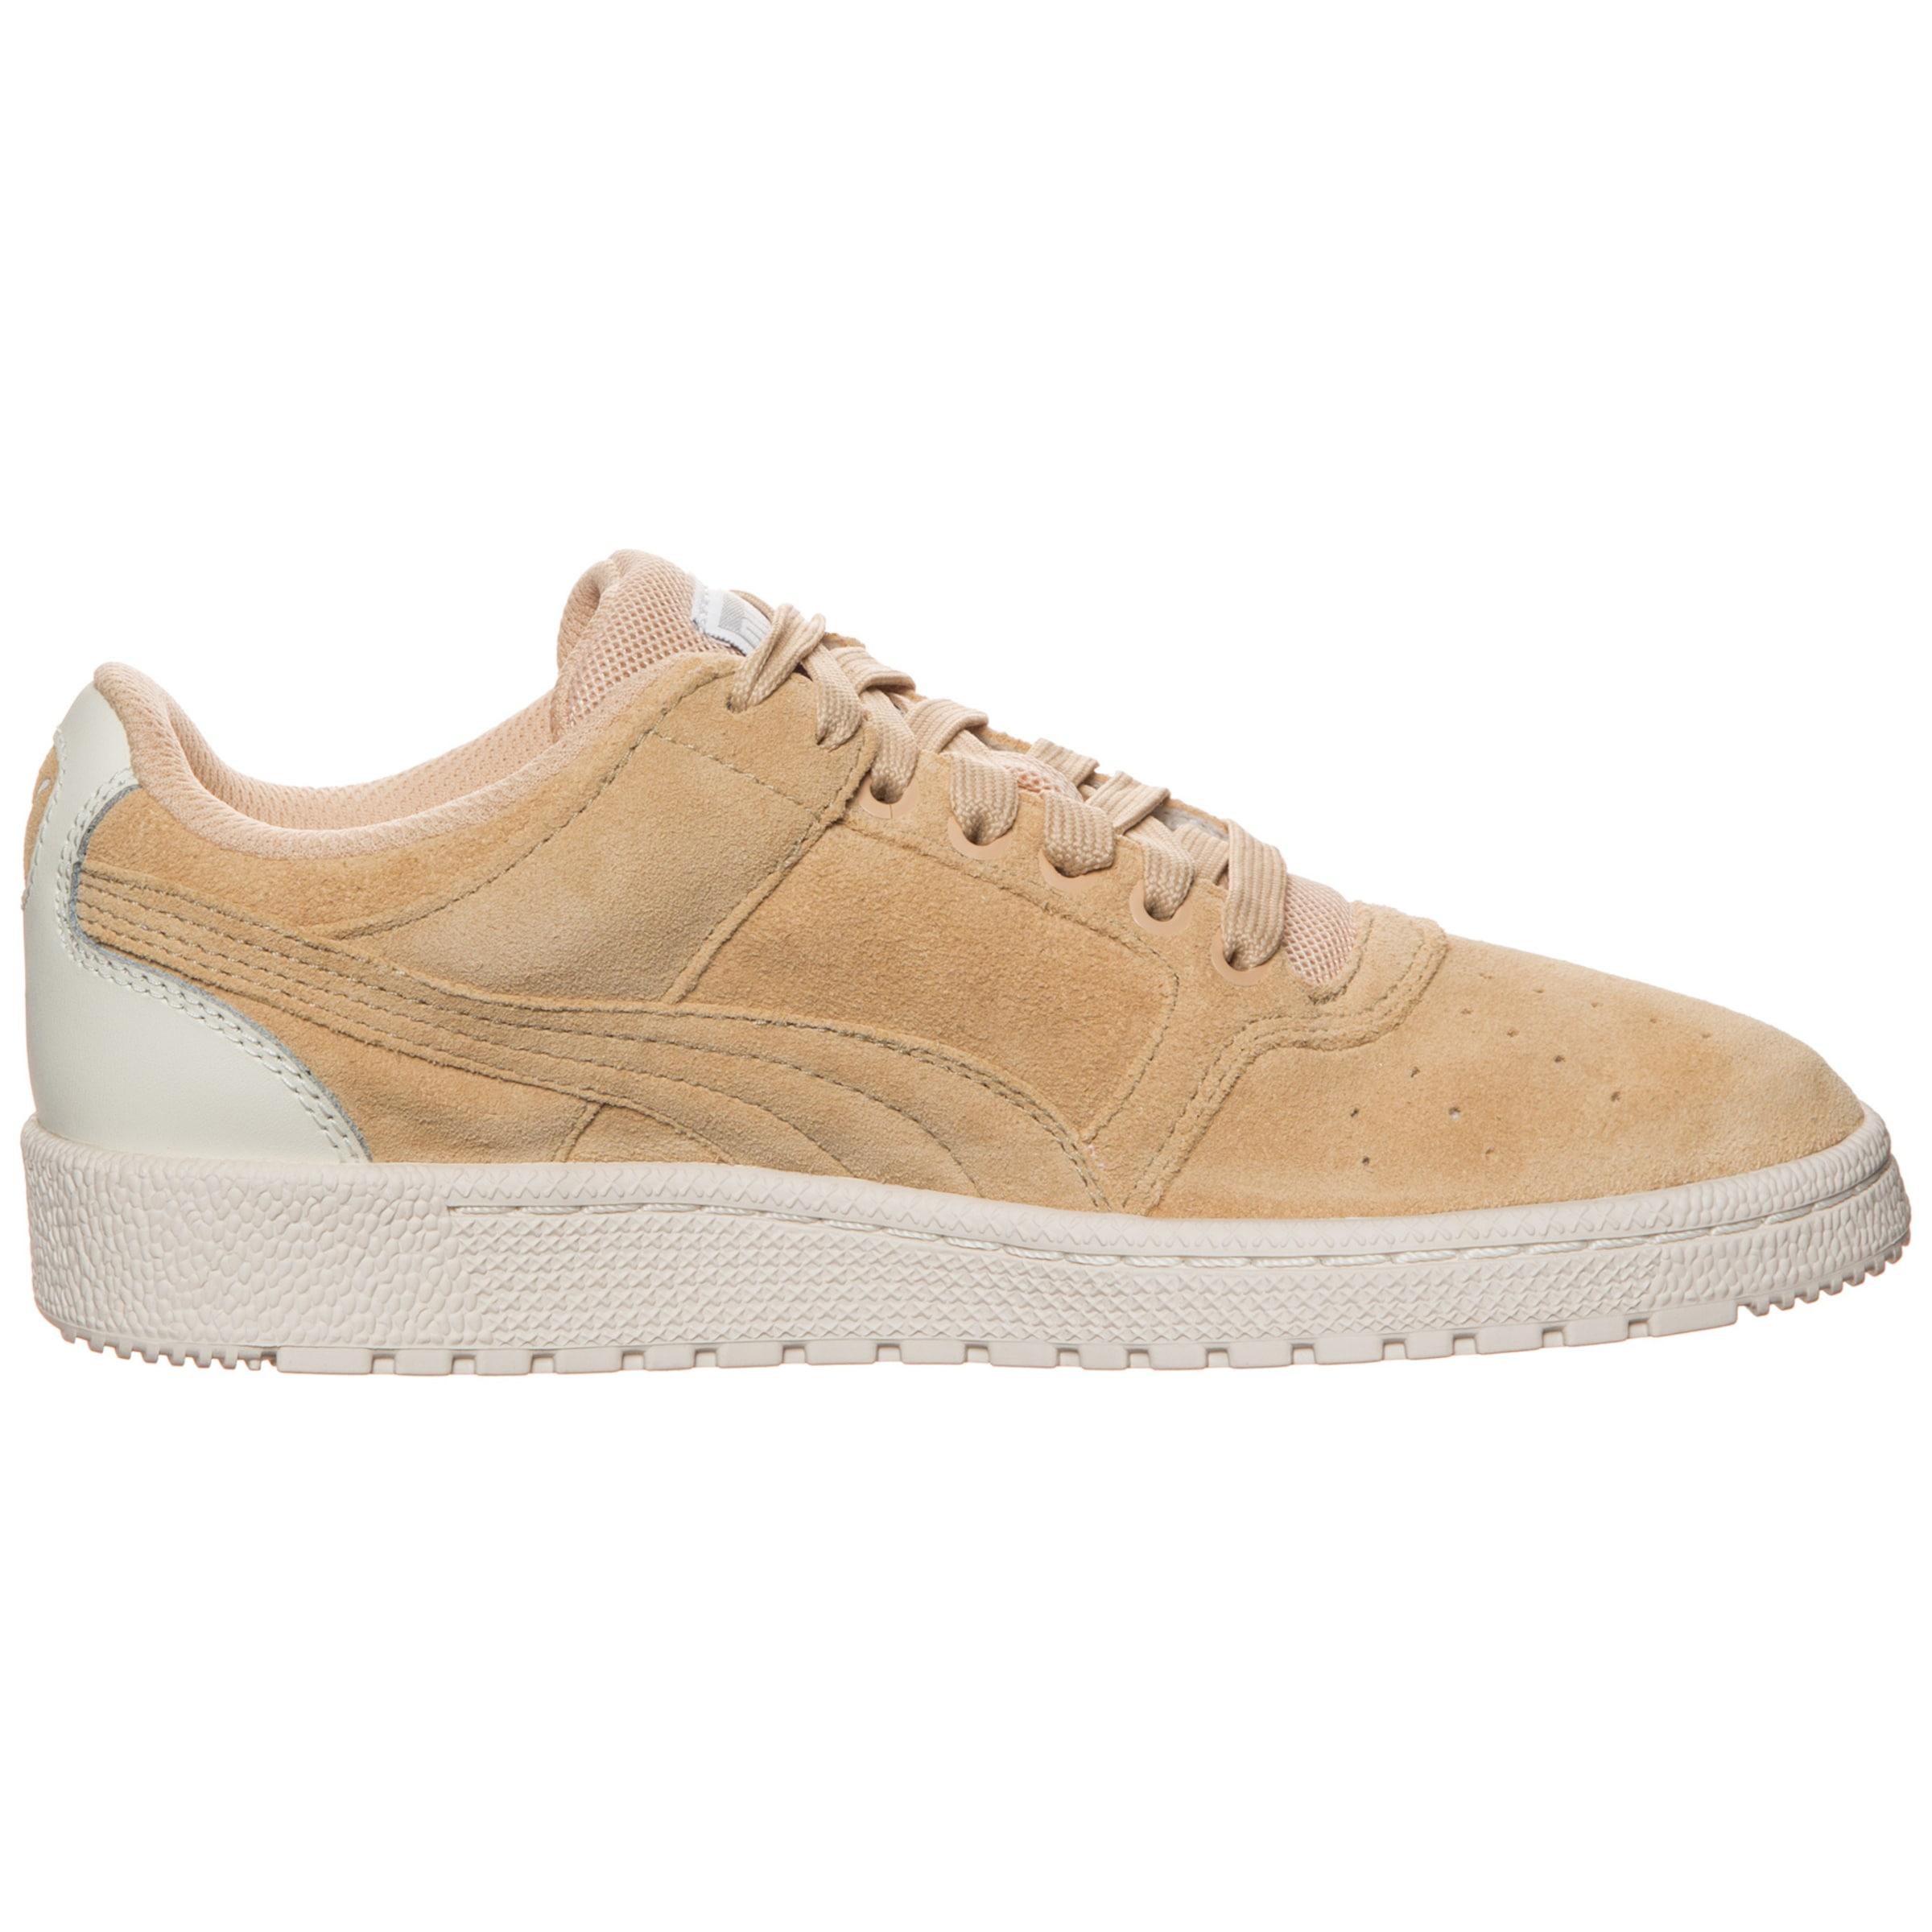 Puma Lo' 'sky Ii Sneaker In BeigeSand wXk8nOP0